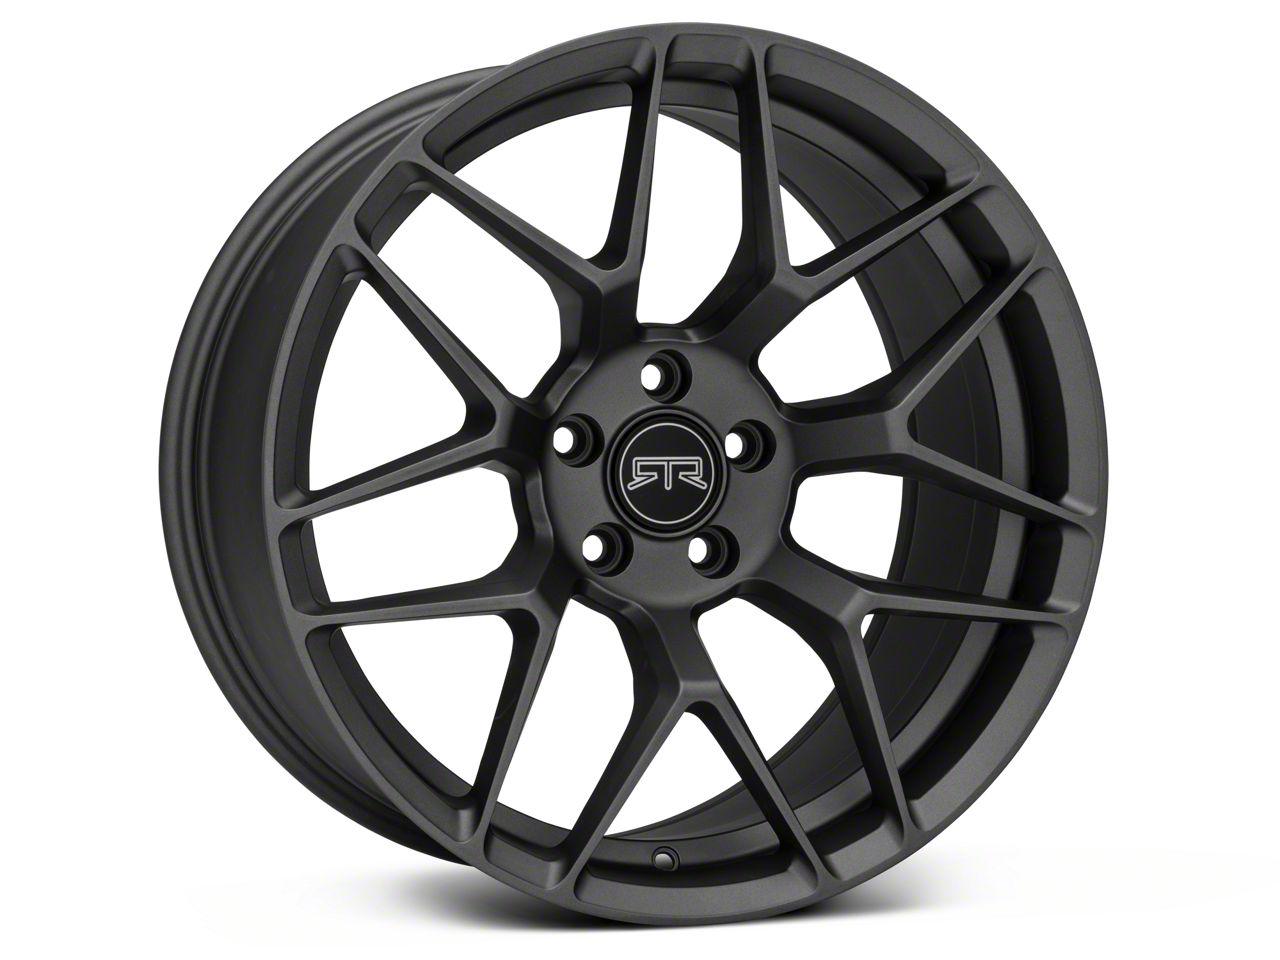 RTR Tech 7 Satin Charcoal Wheel - 19x9.5 (05-19 All)